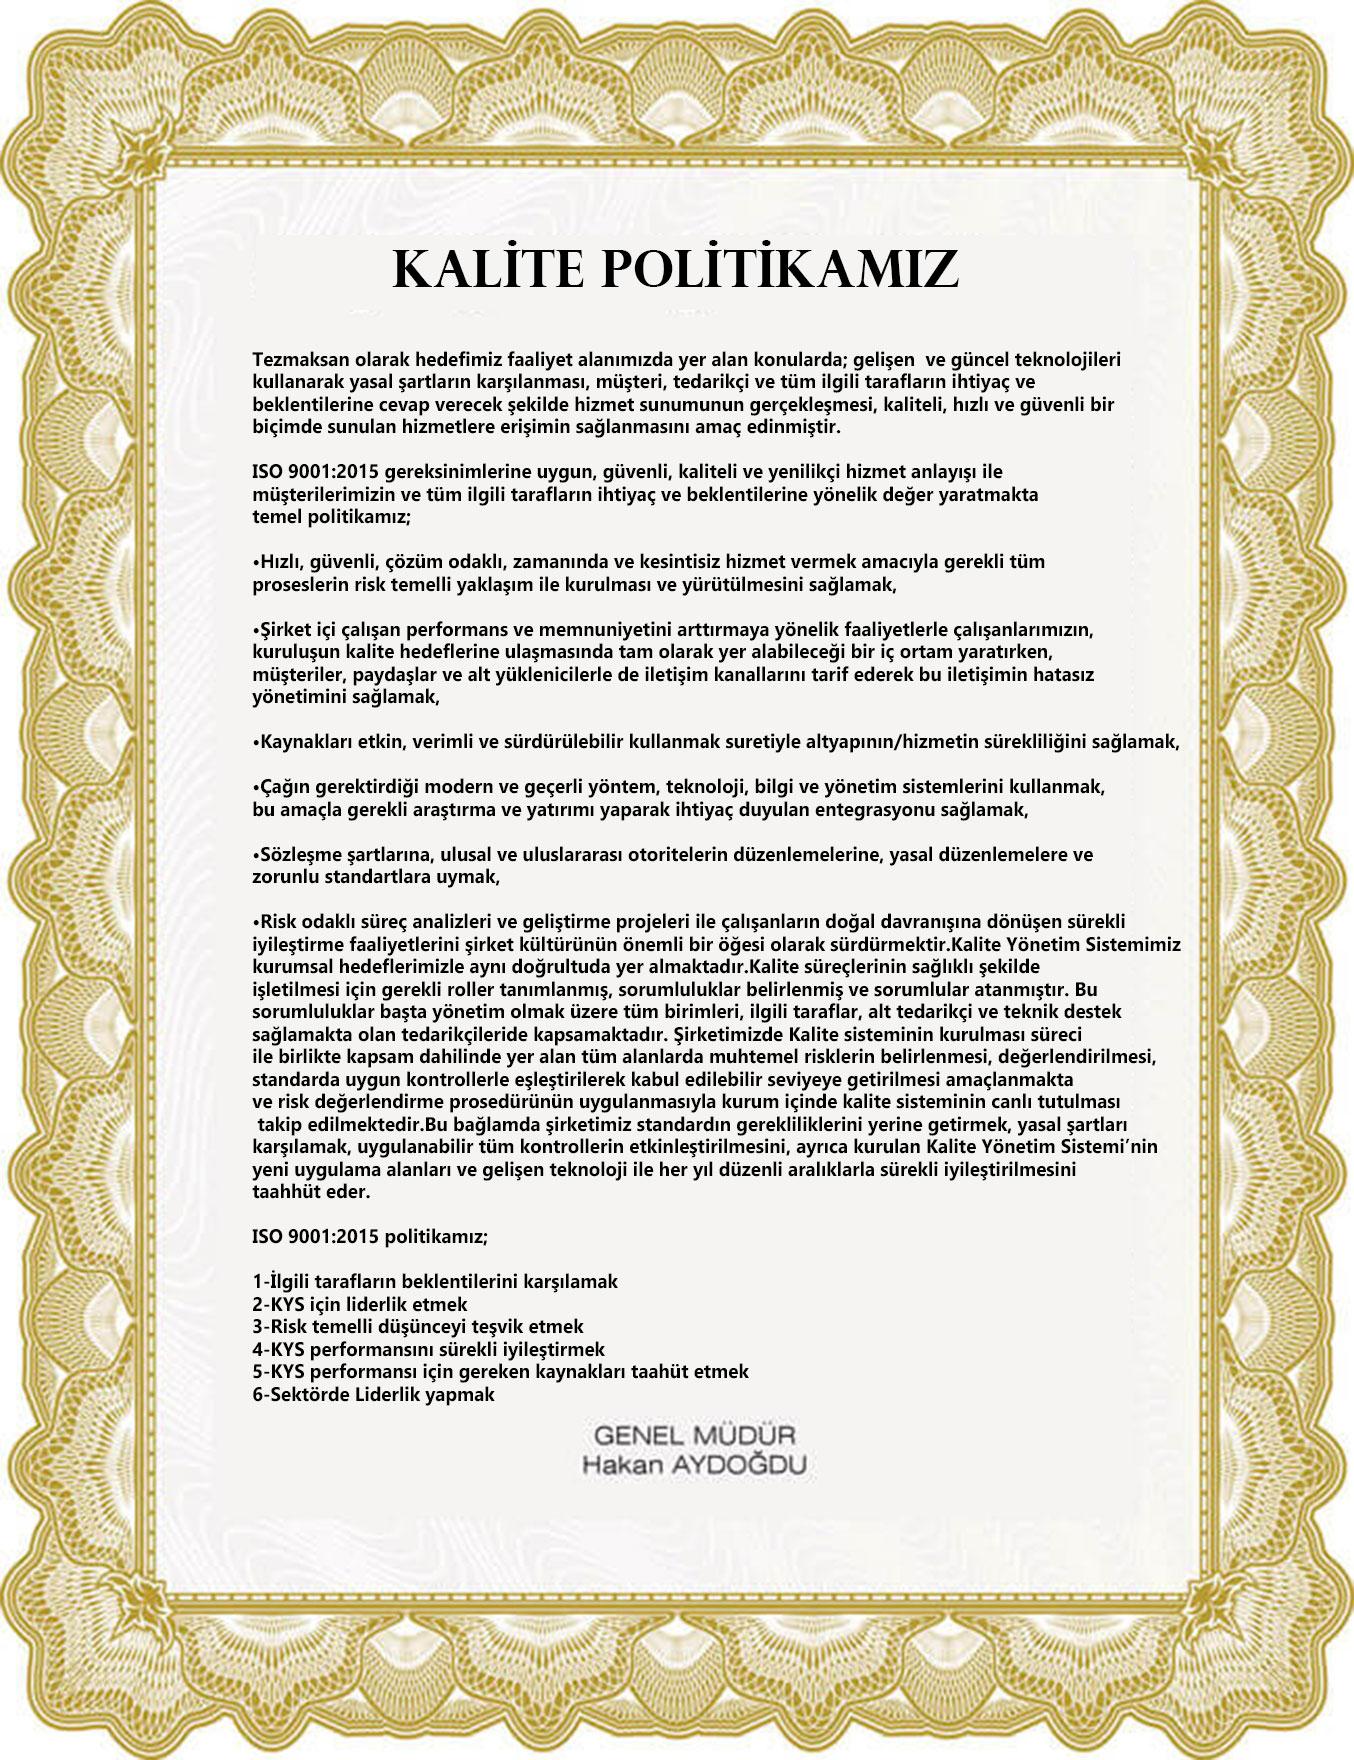 ISO 9001:2015 Politikamız